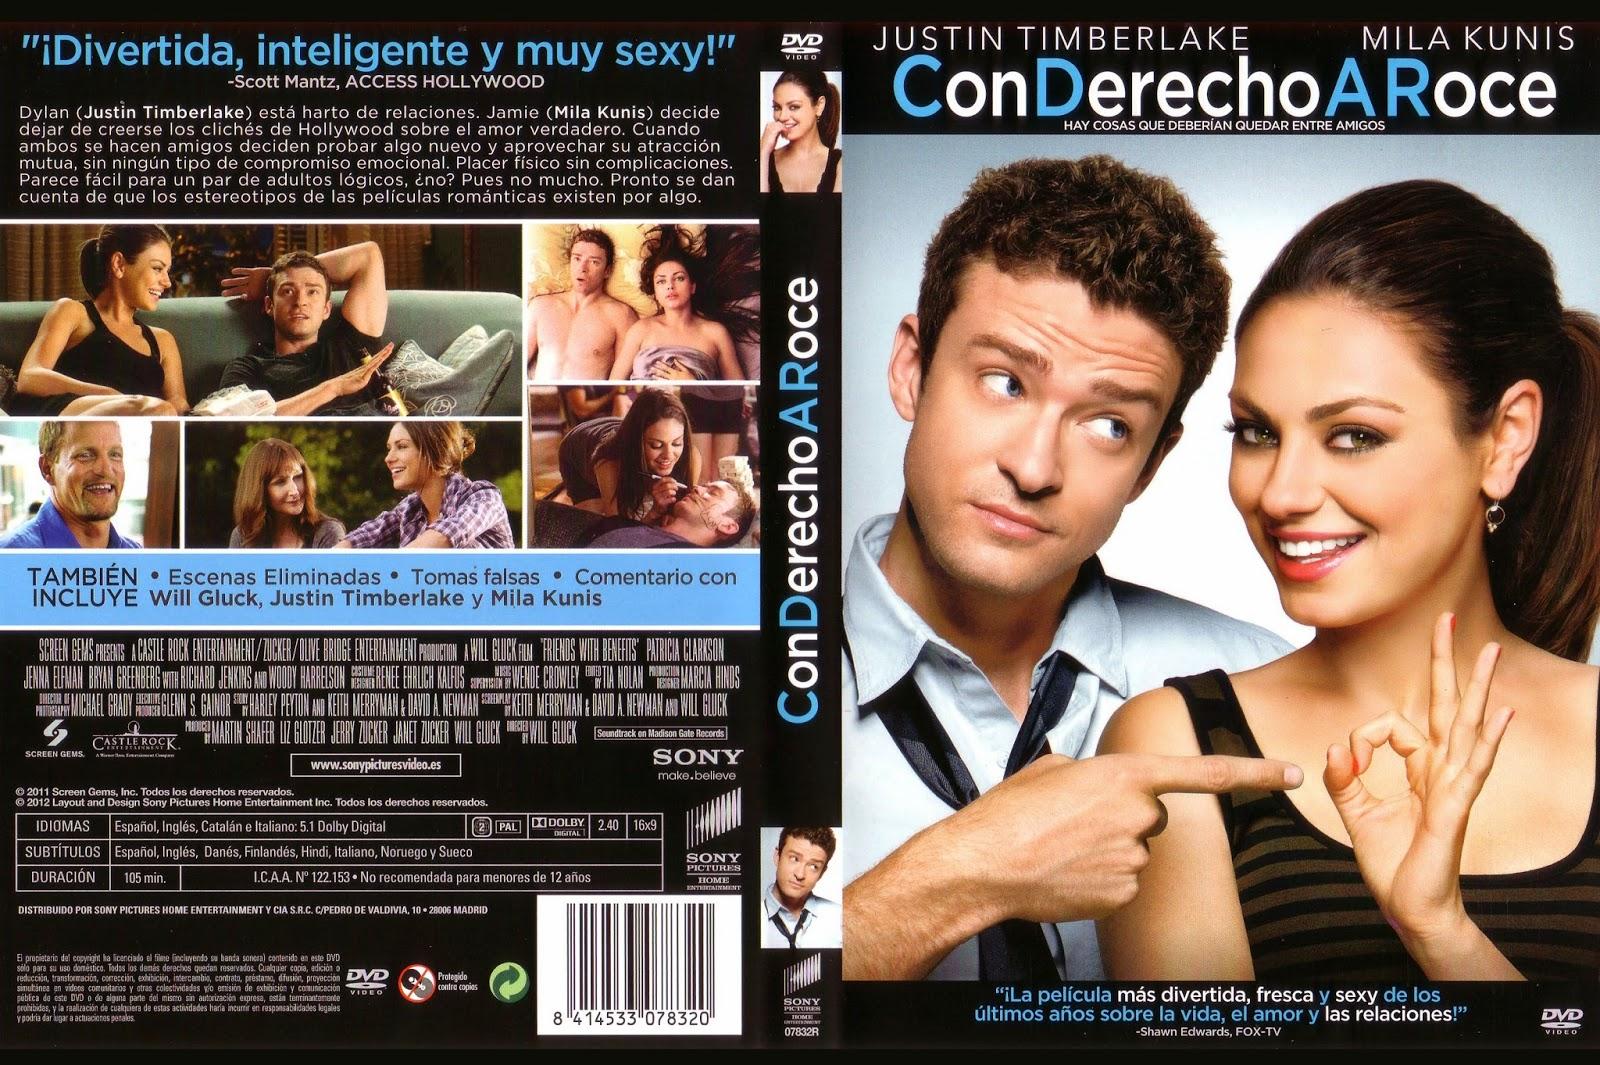 Con Derecho a Roce DVD